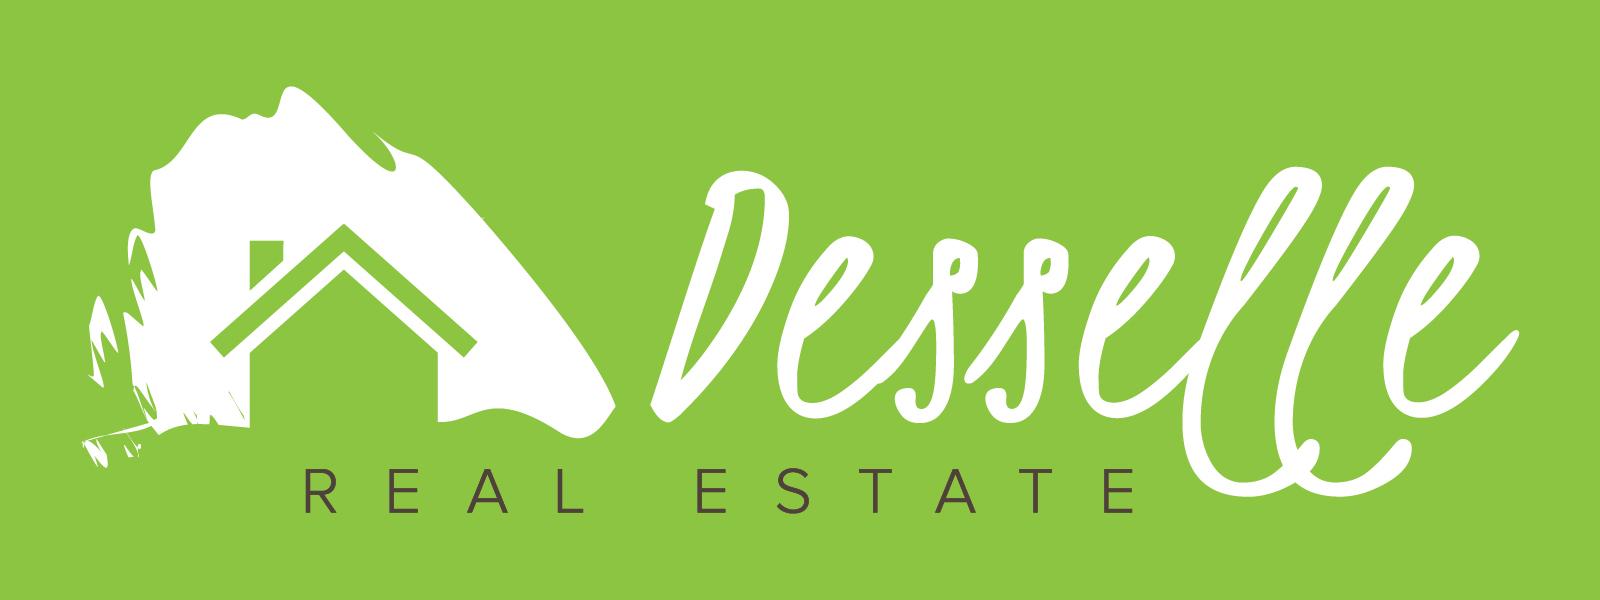 Desselle Real Estate.jpg